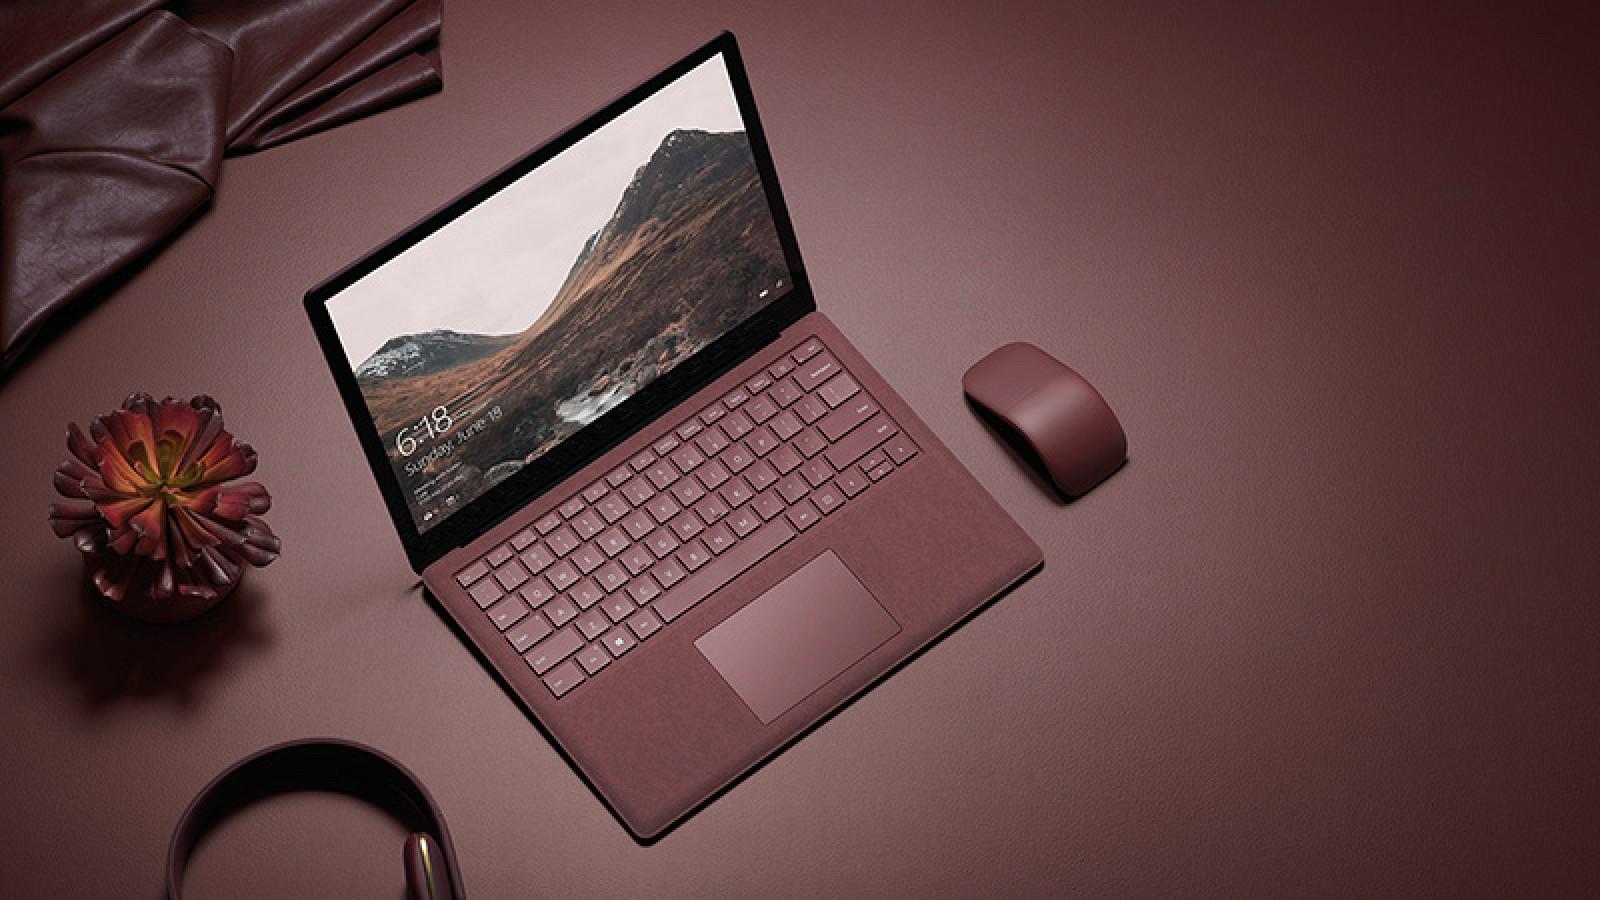 Microsoft представила ноутбук стоимостью 999$ на Windows 10S